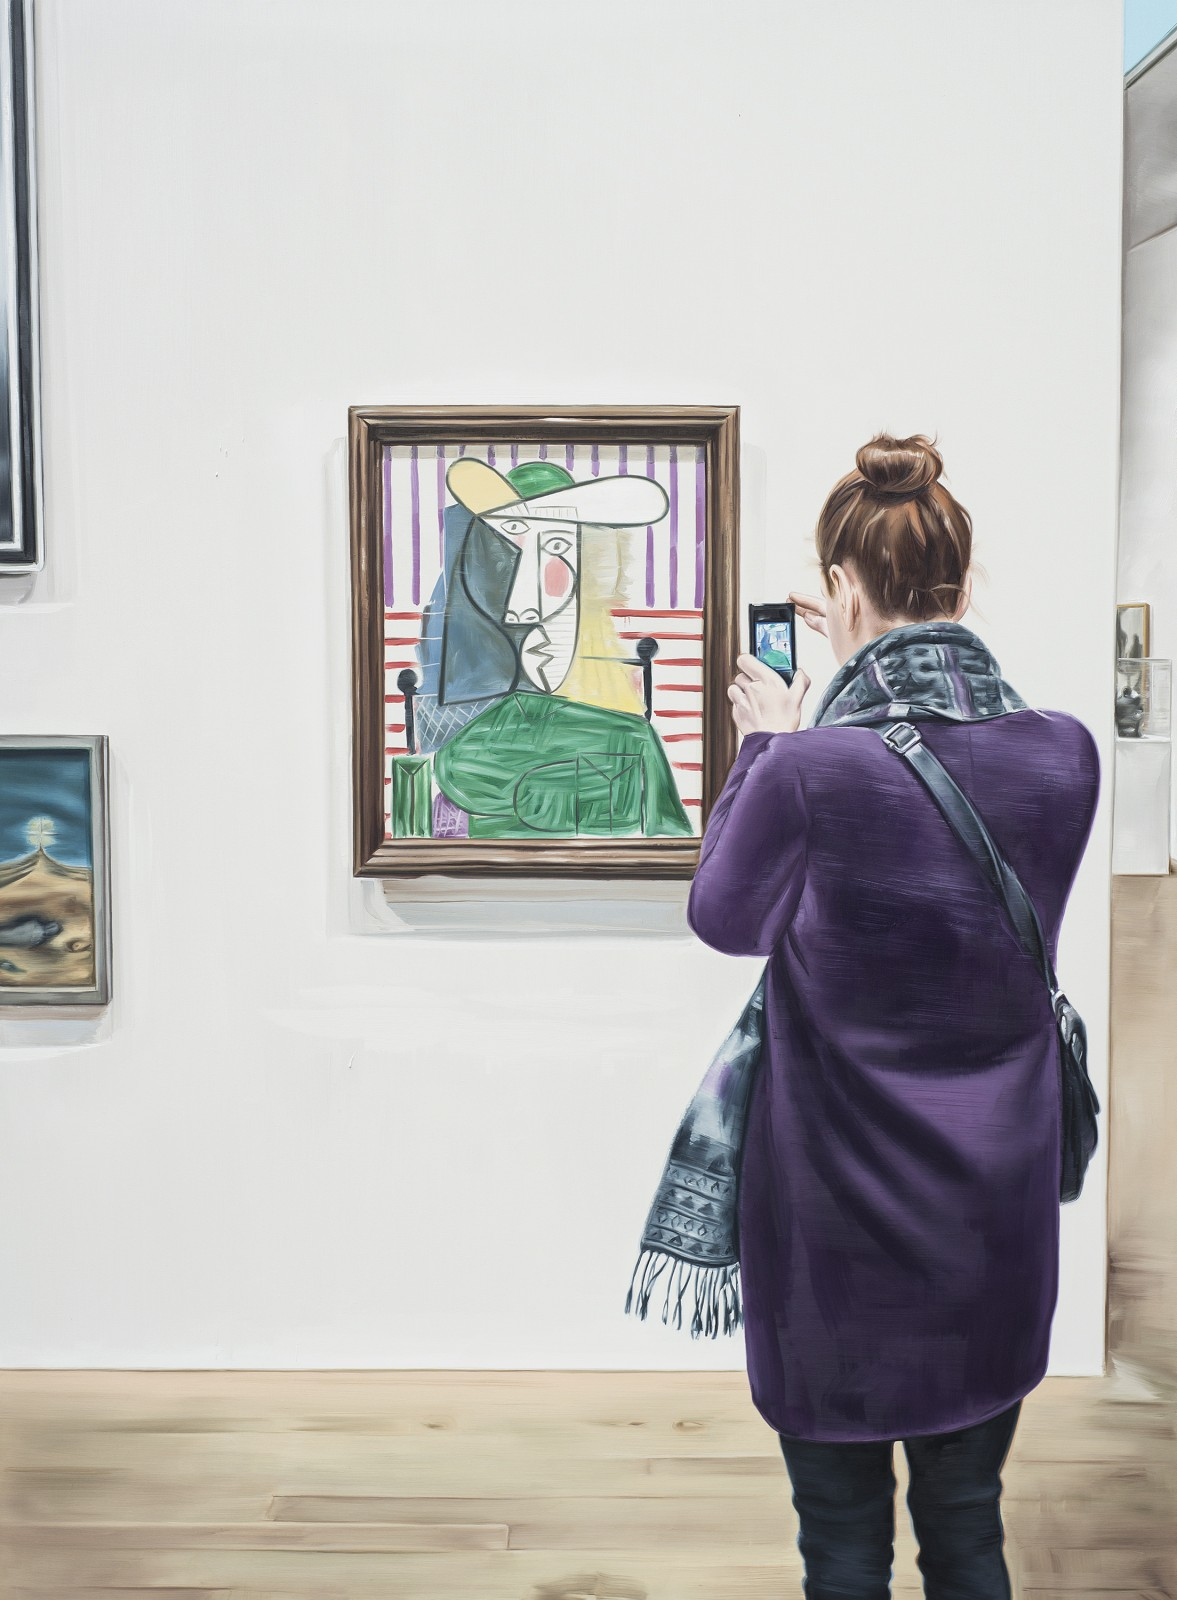 Marcin Maciejowski, Bust of a Woman (1944), 2014, oil on canvas, 190 x 140 cm